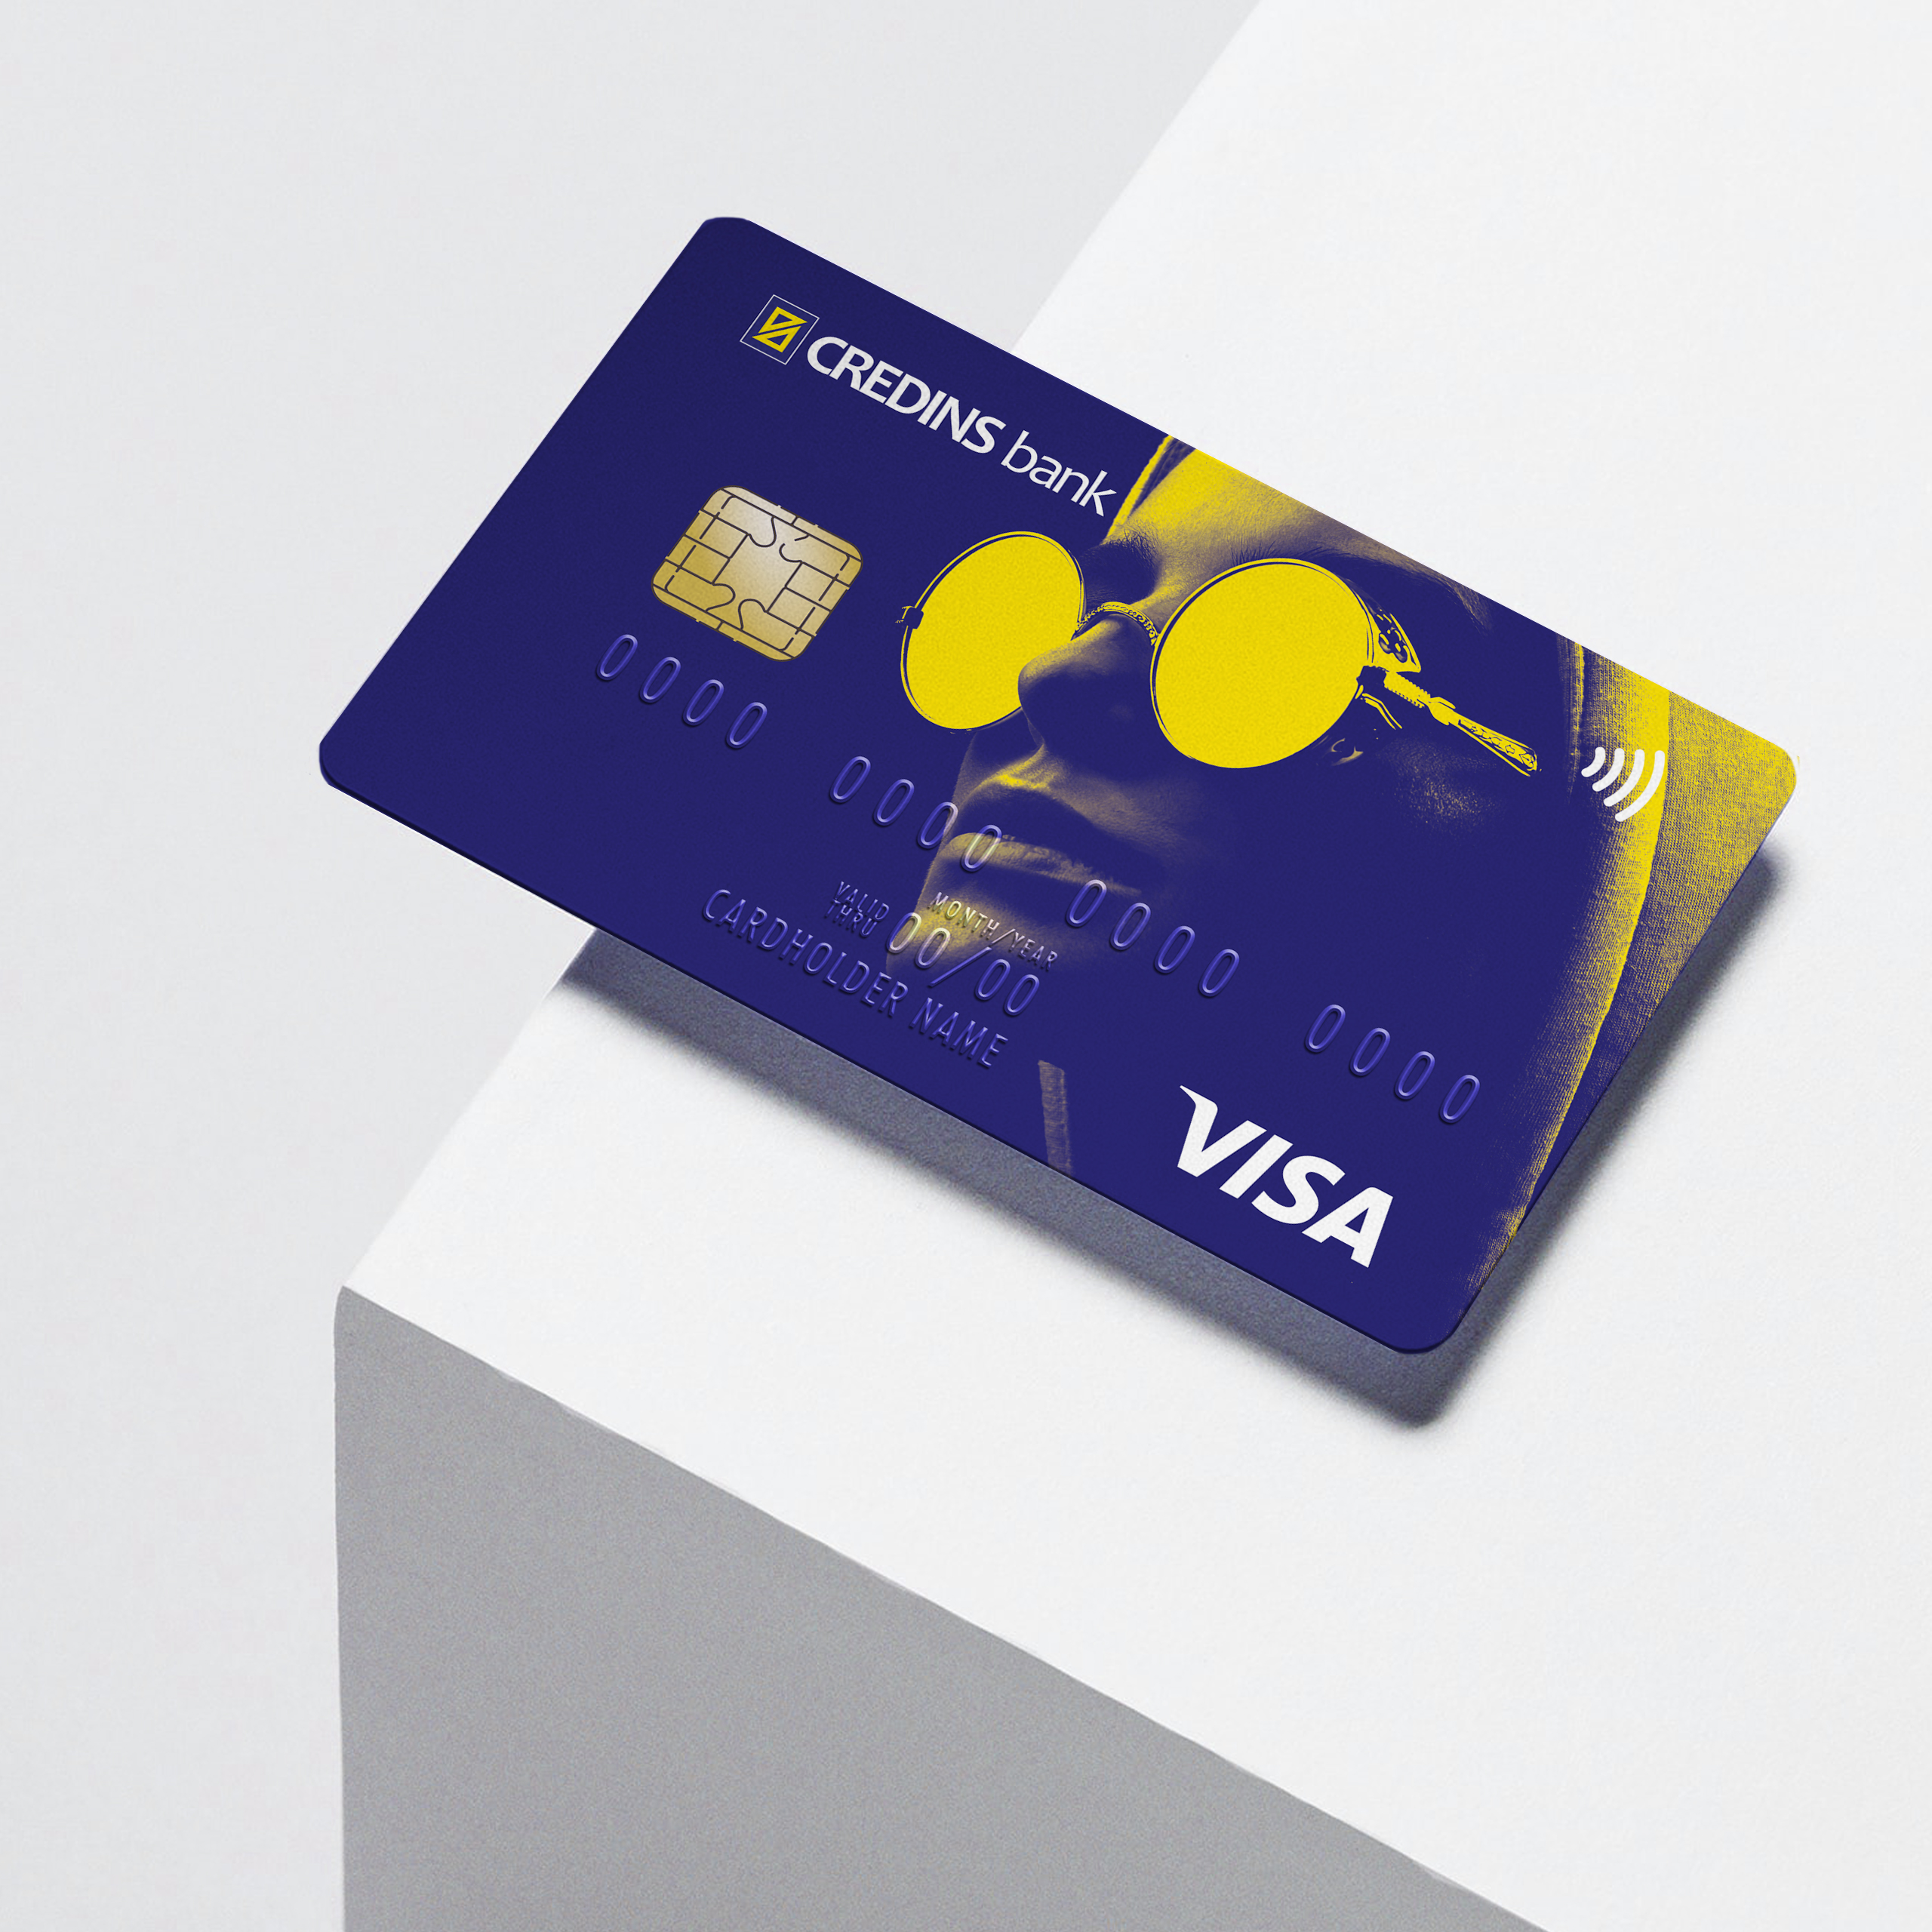 Credins Bank, Project Img 30 - Vatra Agency / Founder & CEO Gerton Bejo